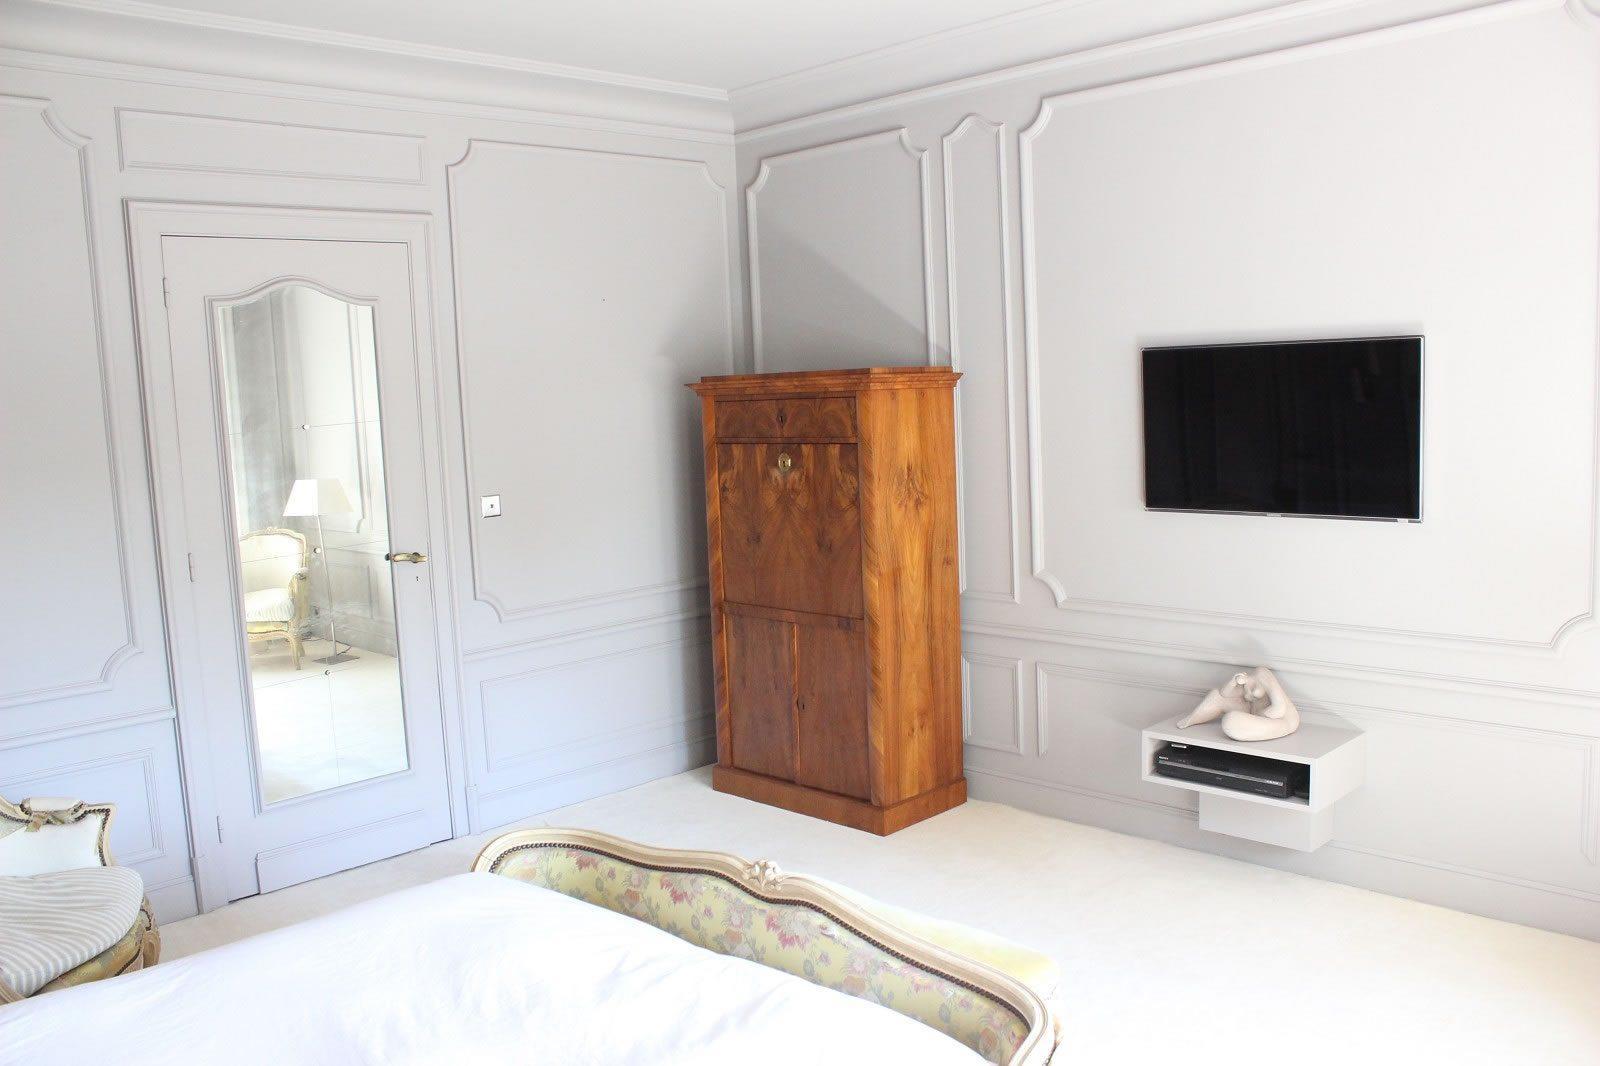 residence-exception-a-vendre-marcq-en-baroeul-croise-laroche-cheminees-terrasse-sud-double-garage-cave-buanderie